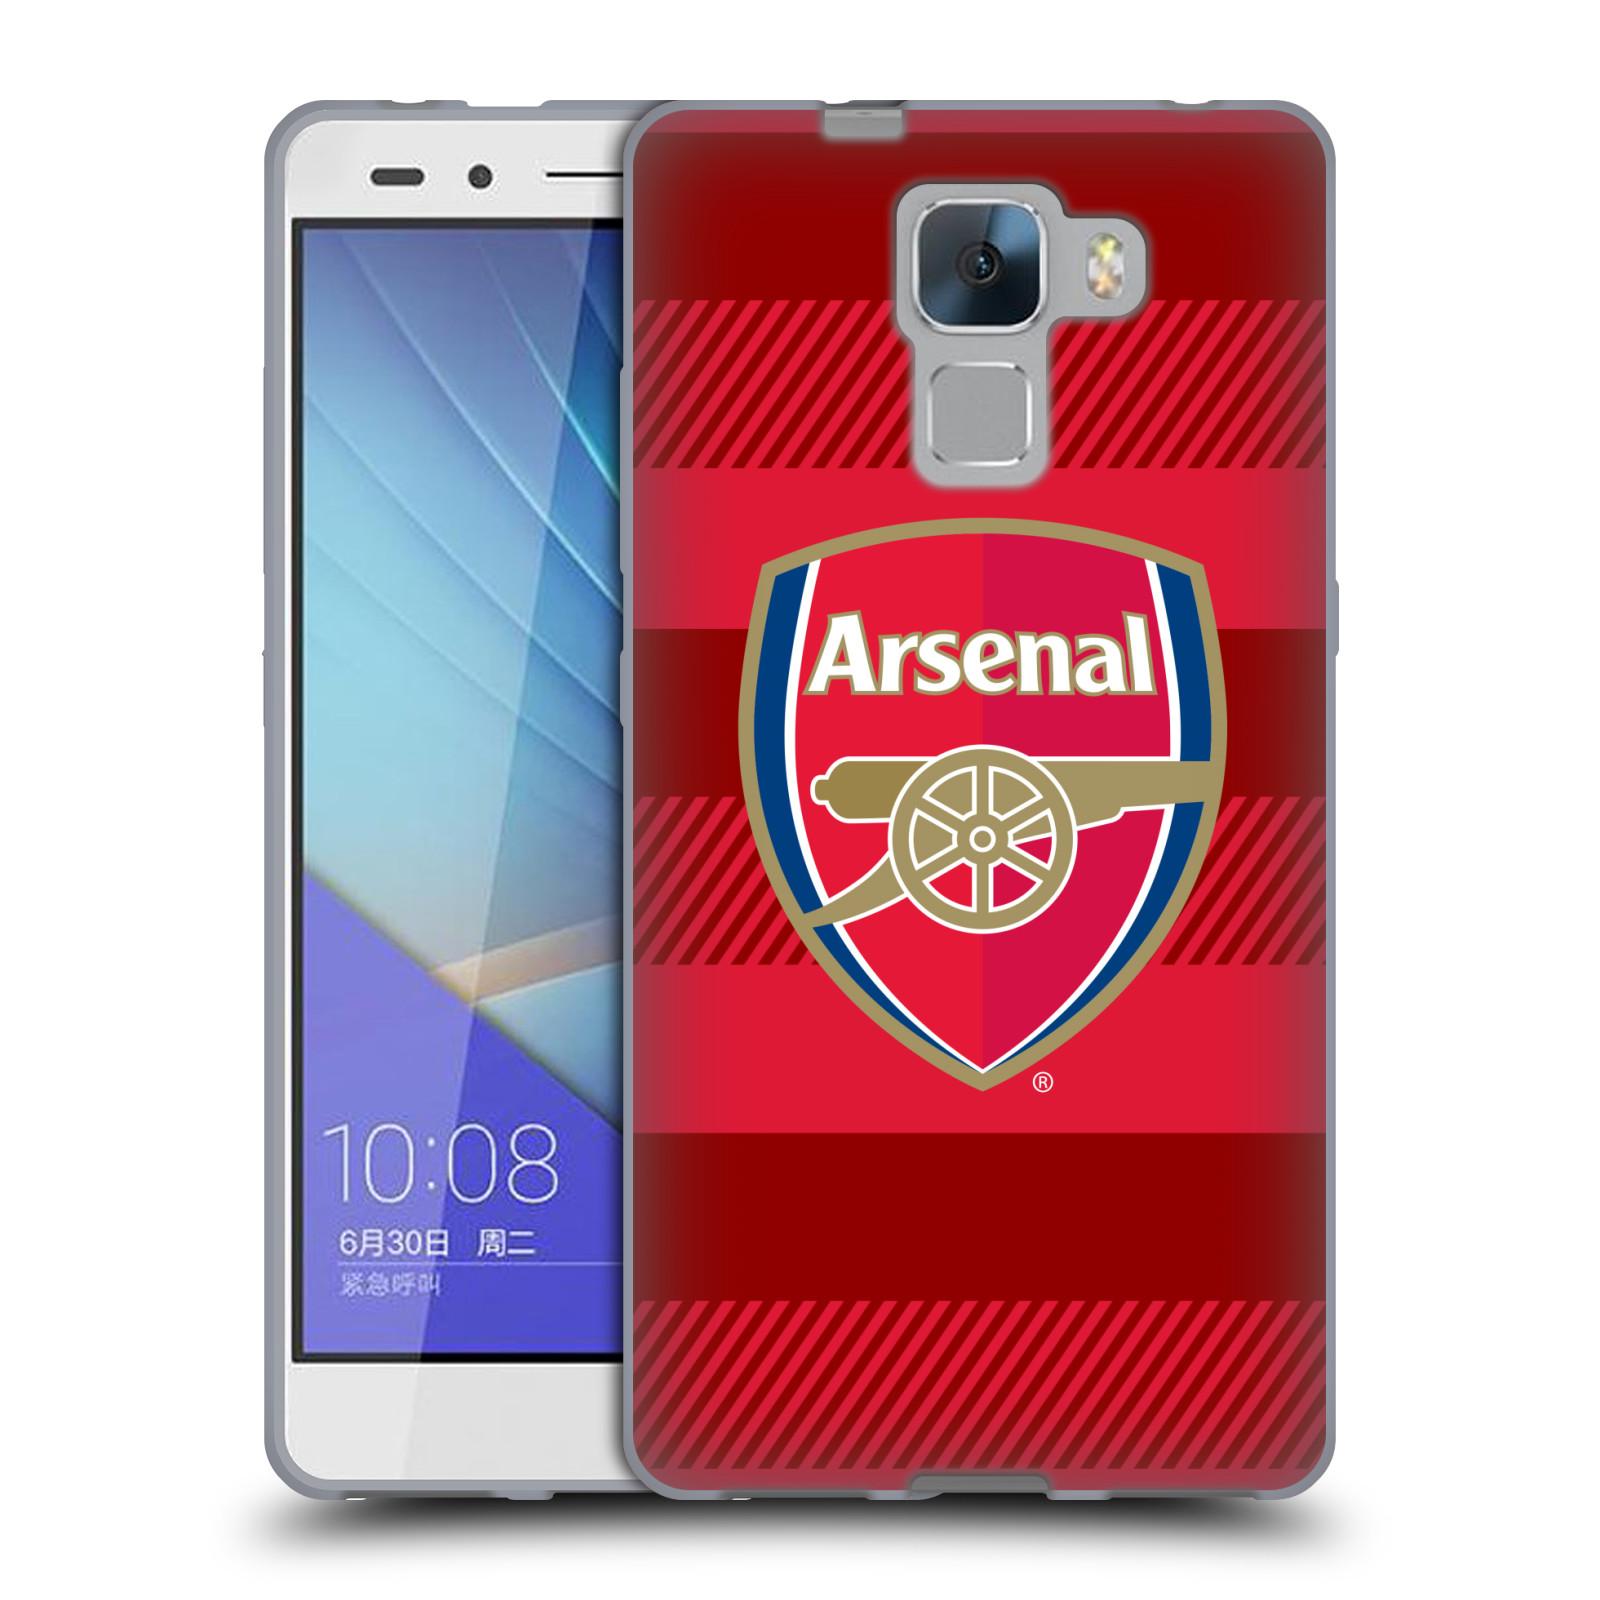 Silikonové pouzdro na mobil Honor 7 - Head Case - Arsenal FC - Logo s pruhy